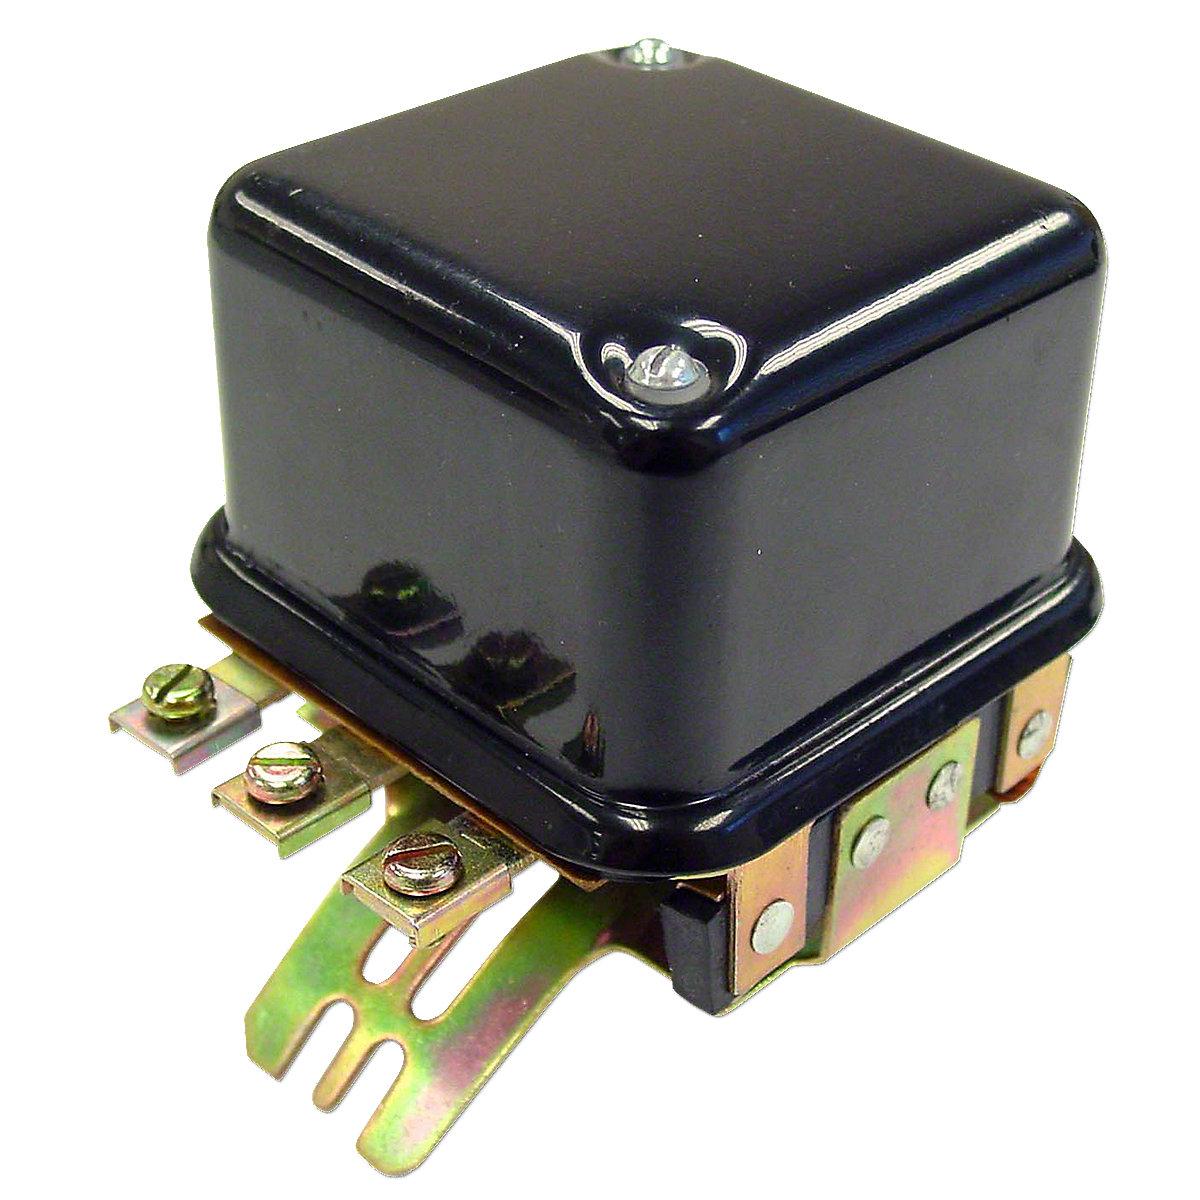 ABC1536 Volt Voltage Regulator